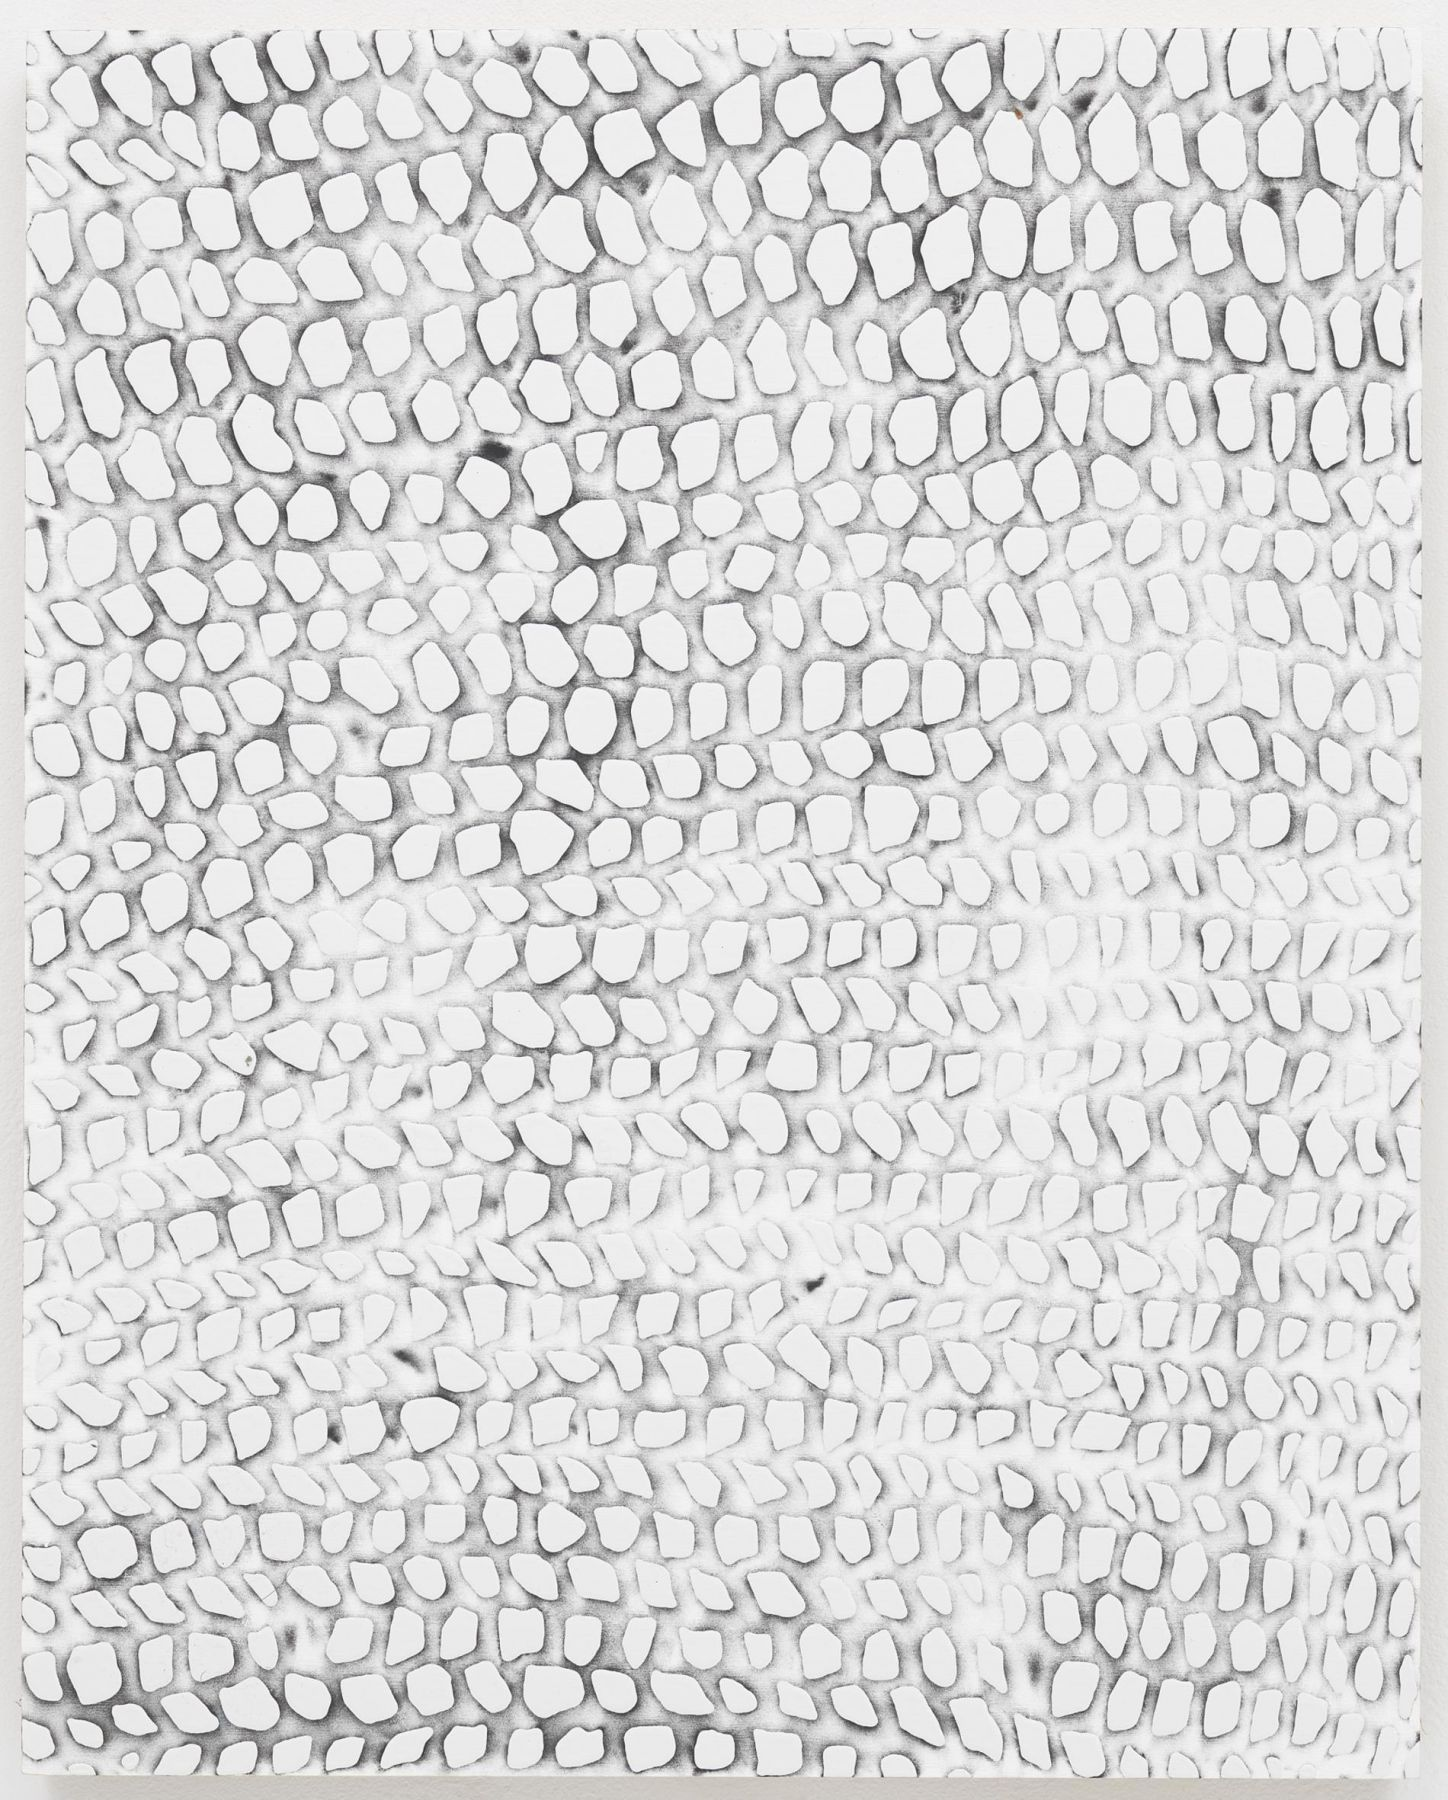 , MICHELLE GRABNERUntitled,2014Enamel on panel20 x 16 x 7/8 in. (50.8 x 40.6 x 2.2 cm)